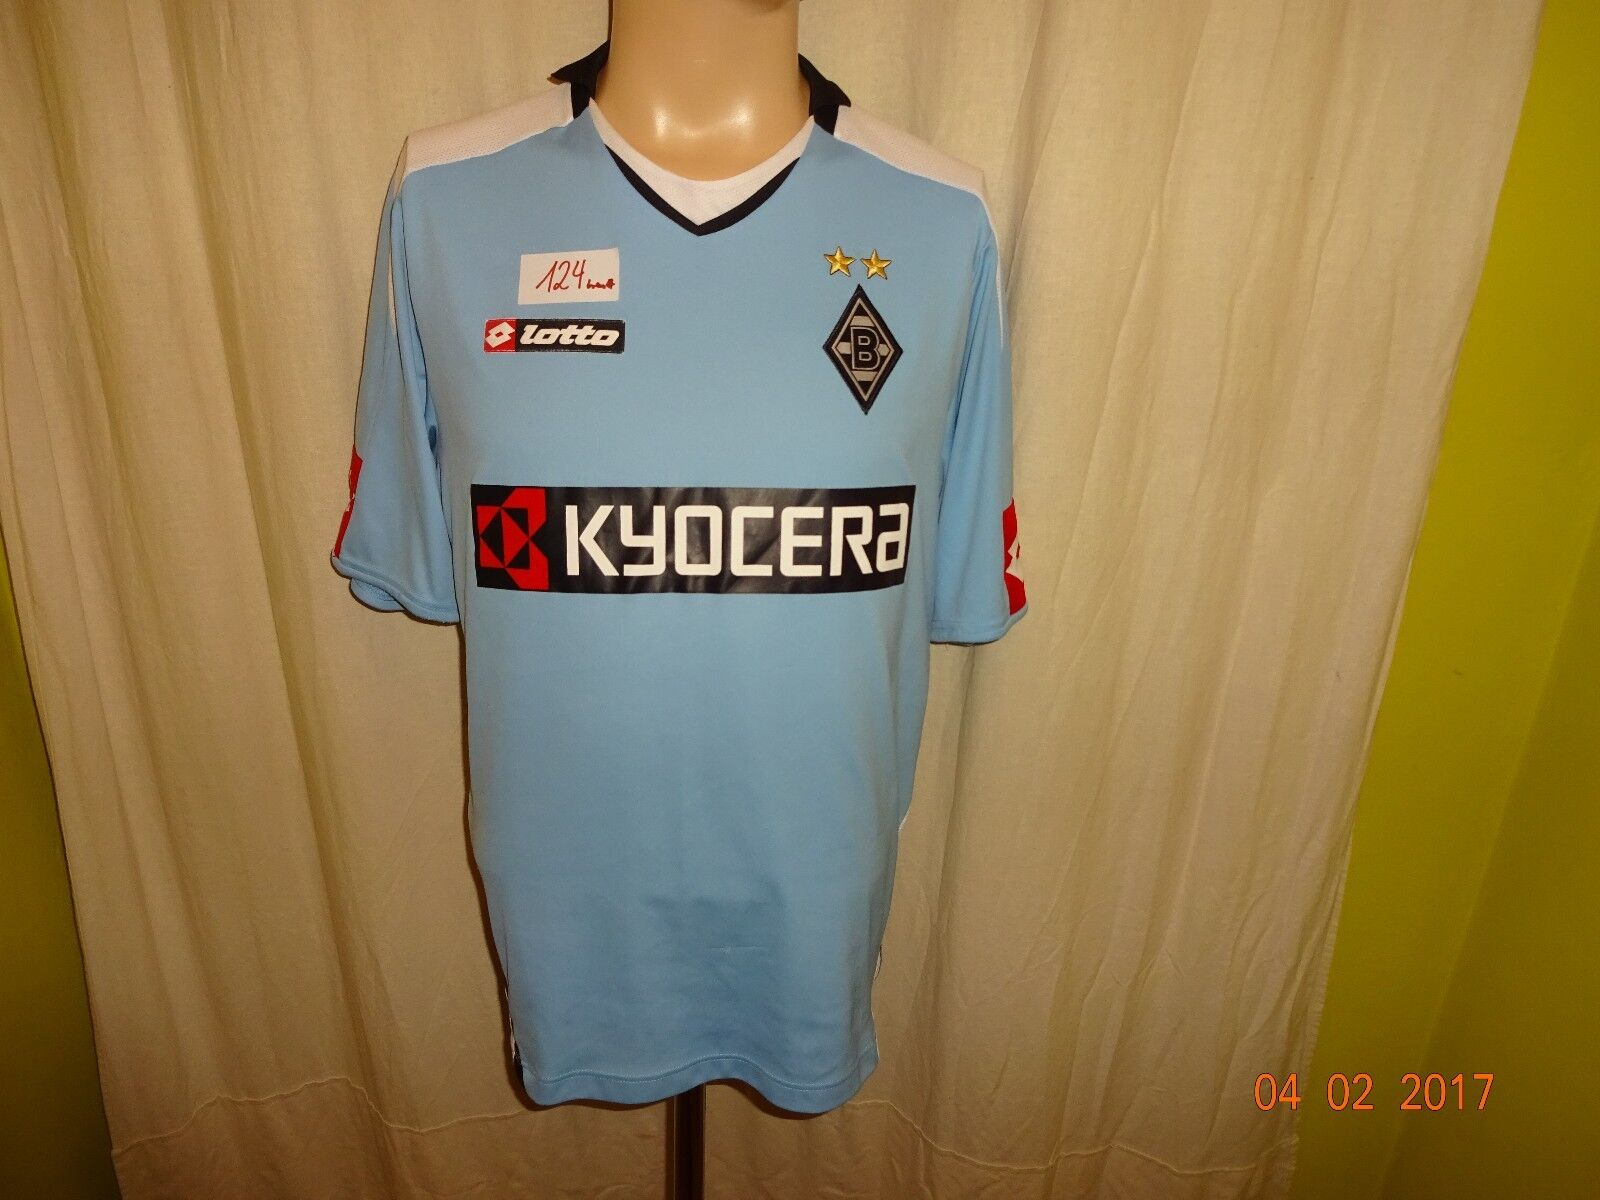 Borussia Mönchengladbach Lotto Auswärts Trikot 2008 09  KYOCERA  Gr.M